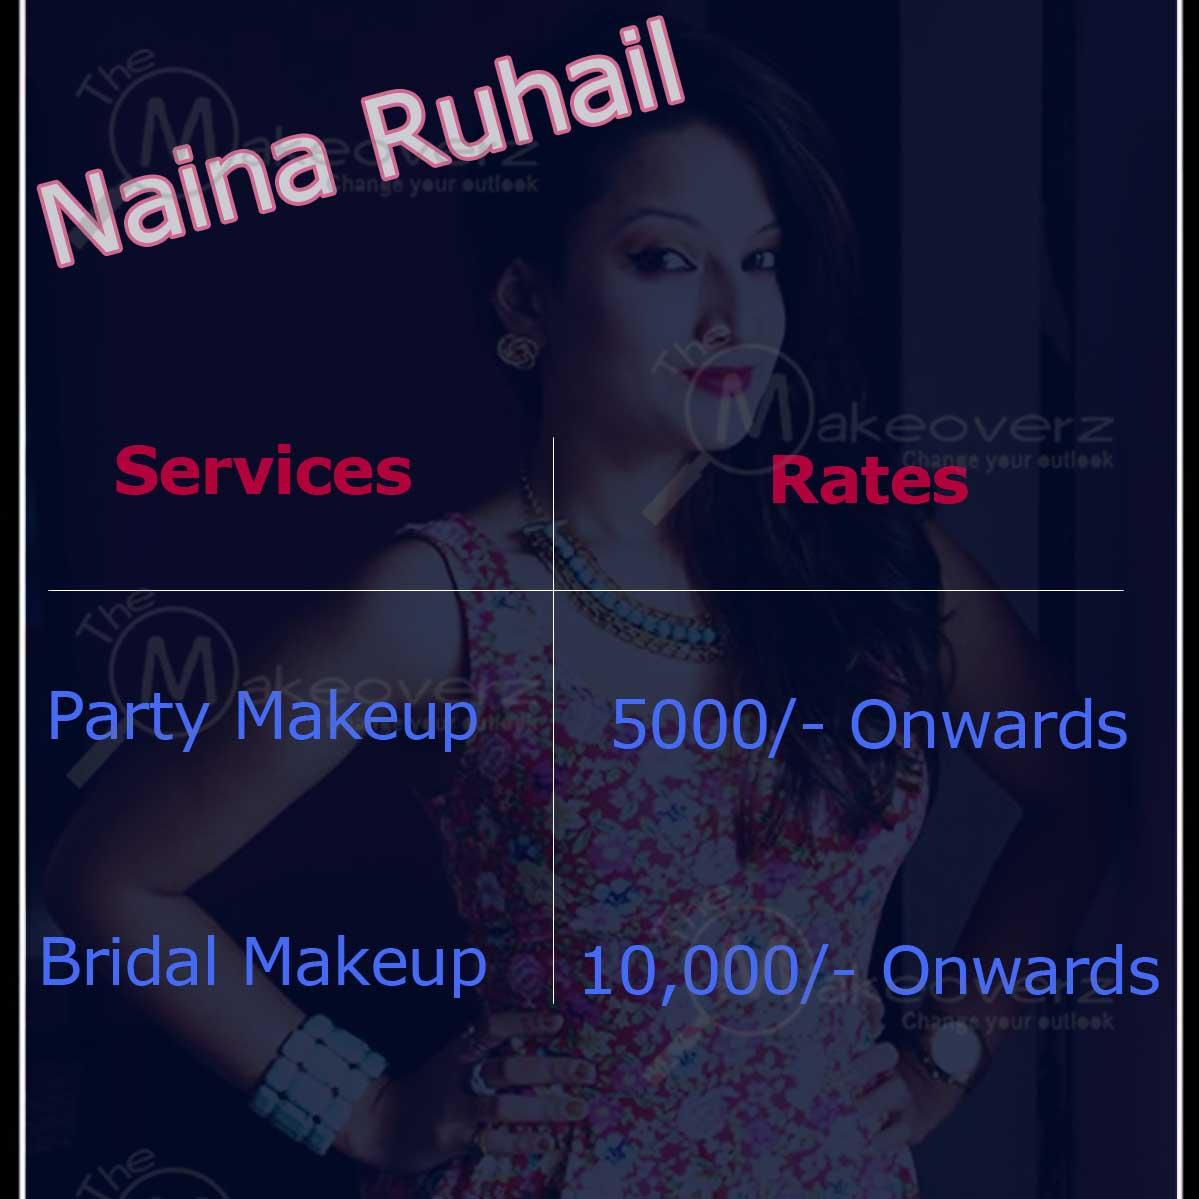 Naina Ruhail - Dwarka